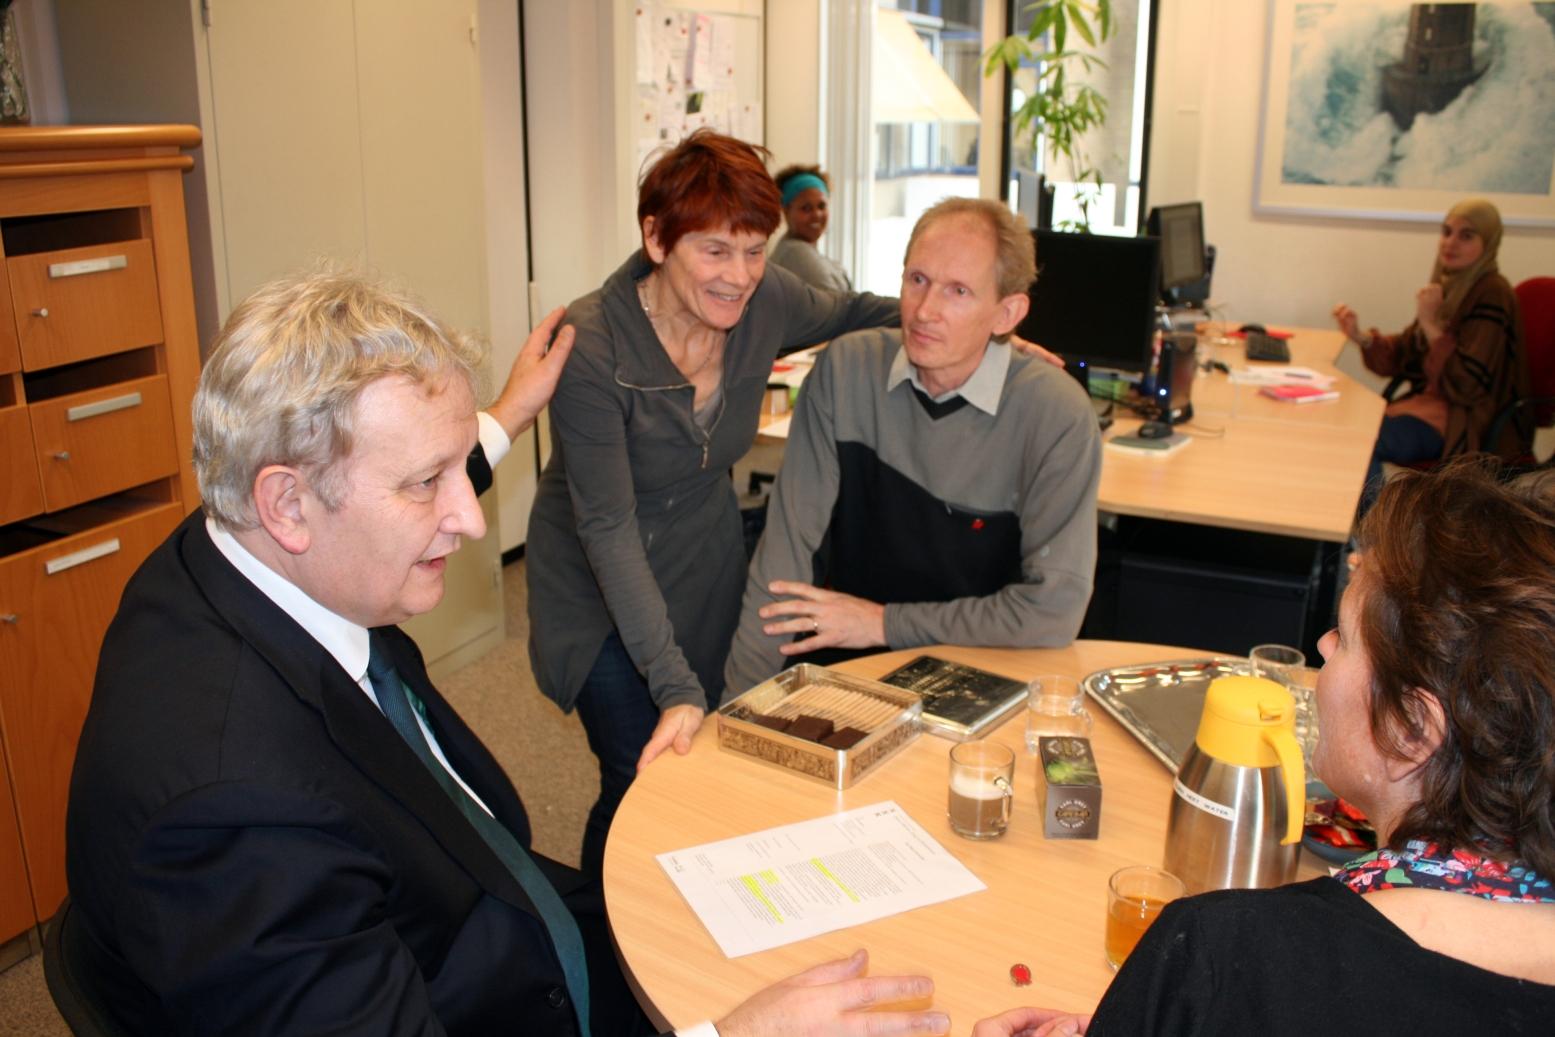 Burgemeester Van der Laan in gesprek met medewerker I & K